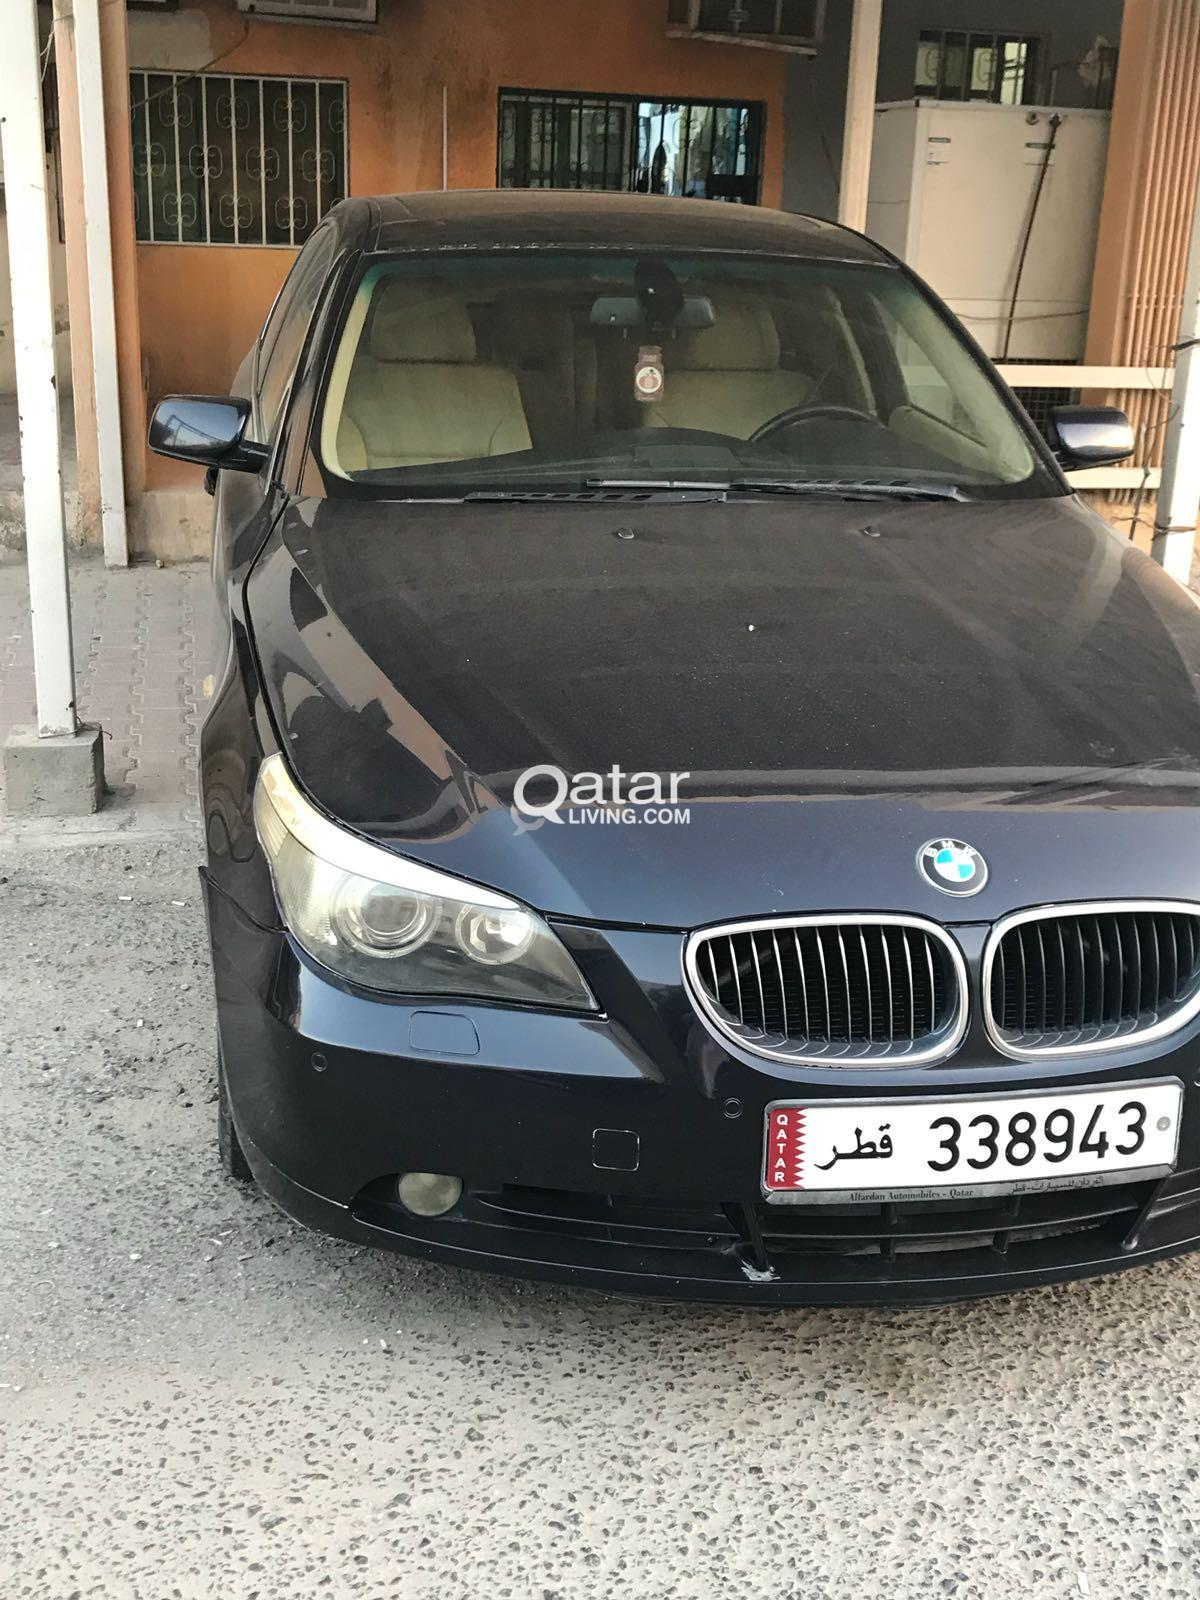 Bmw 525i For Sale Qatar Living